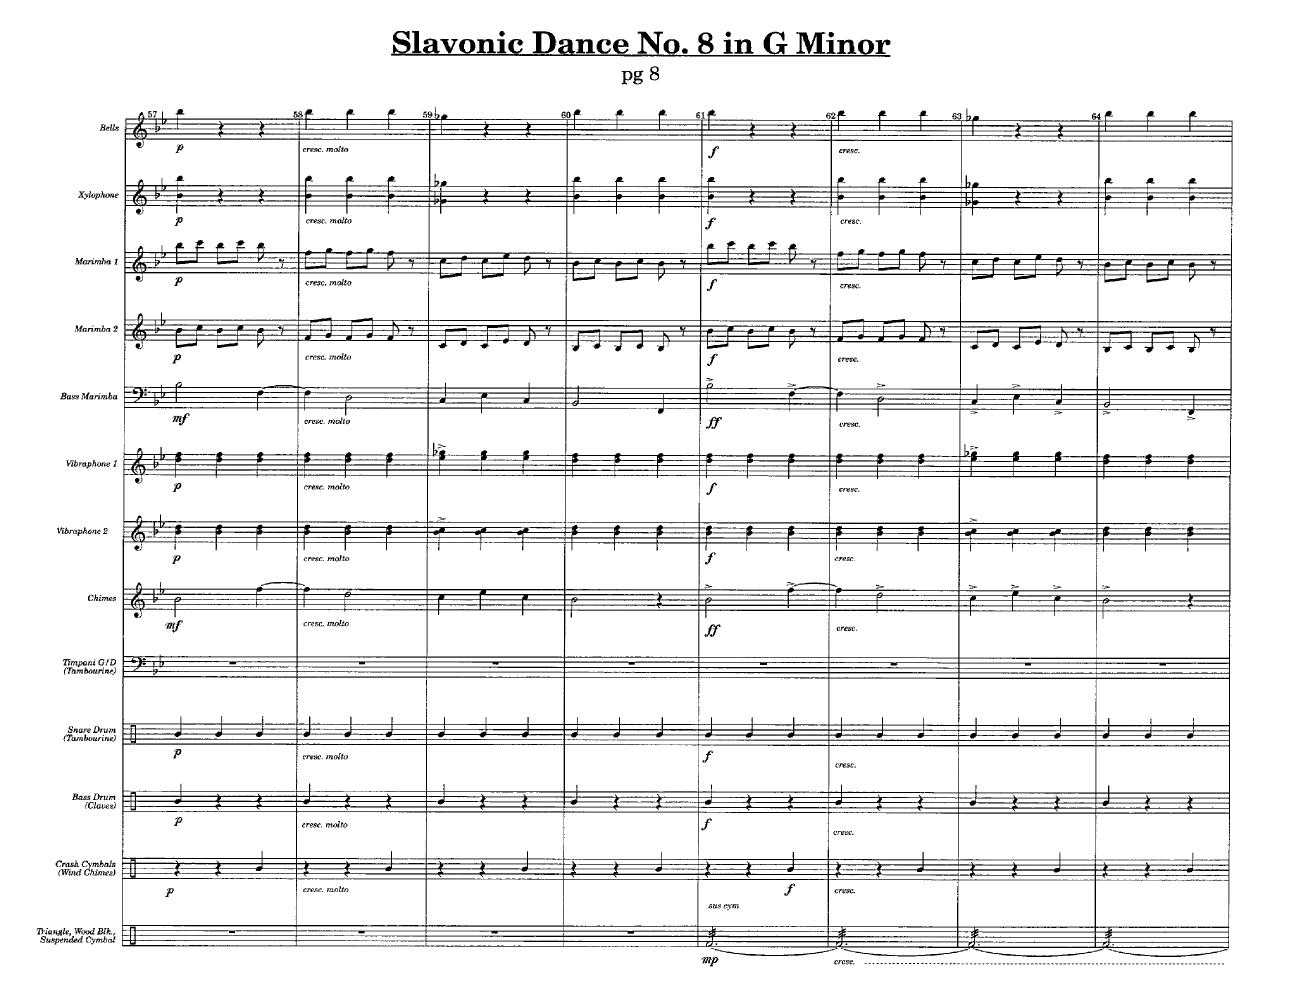 Slavonic Dance No. 8 in G Minor Thumbnail